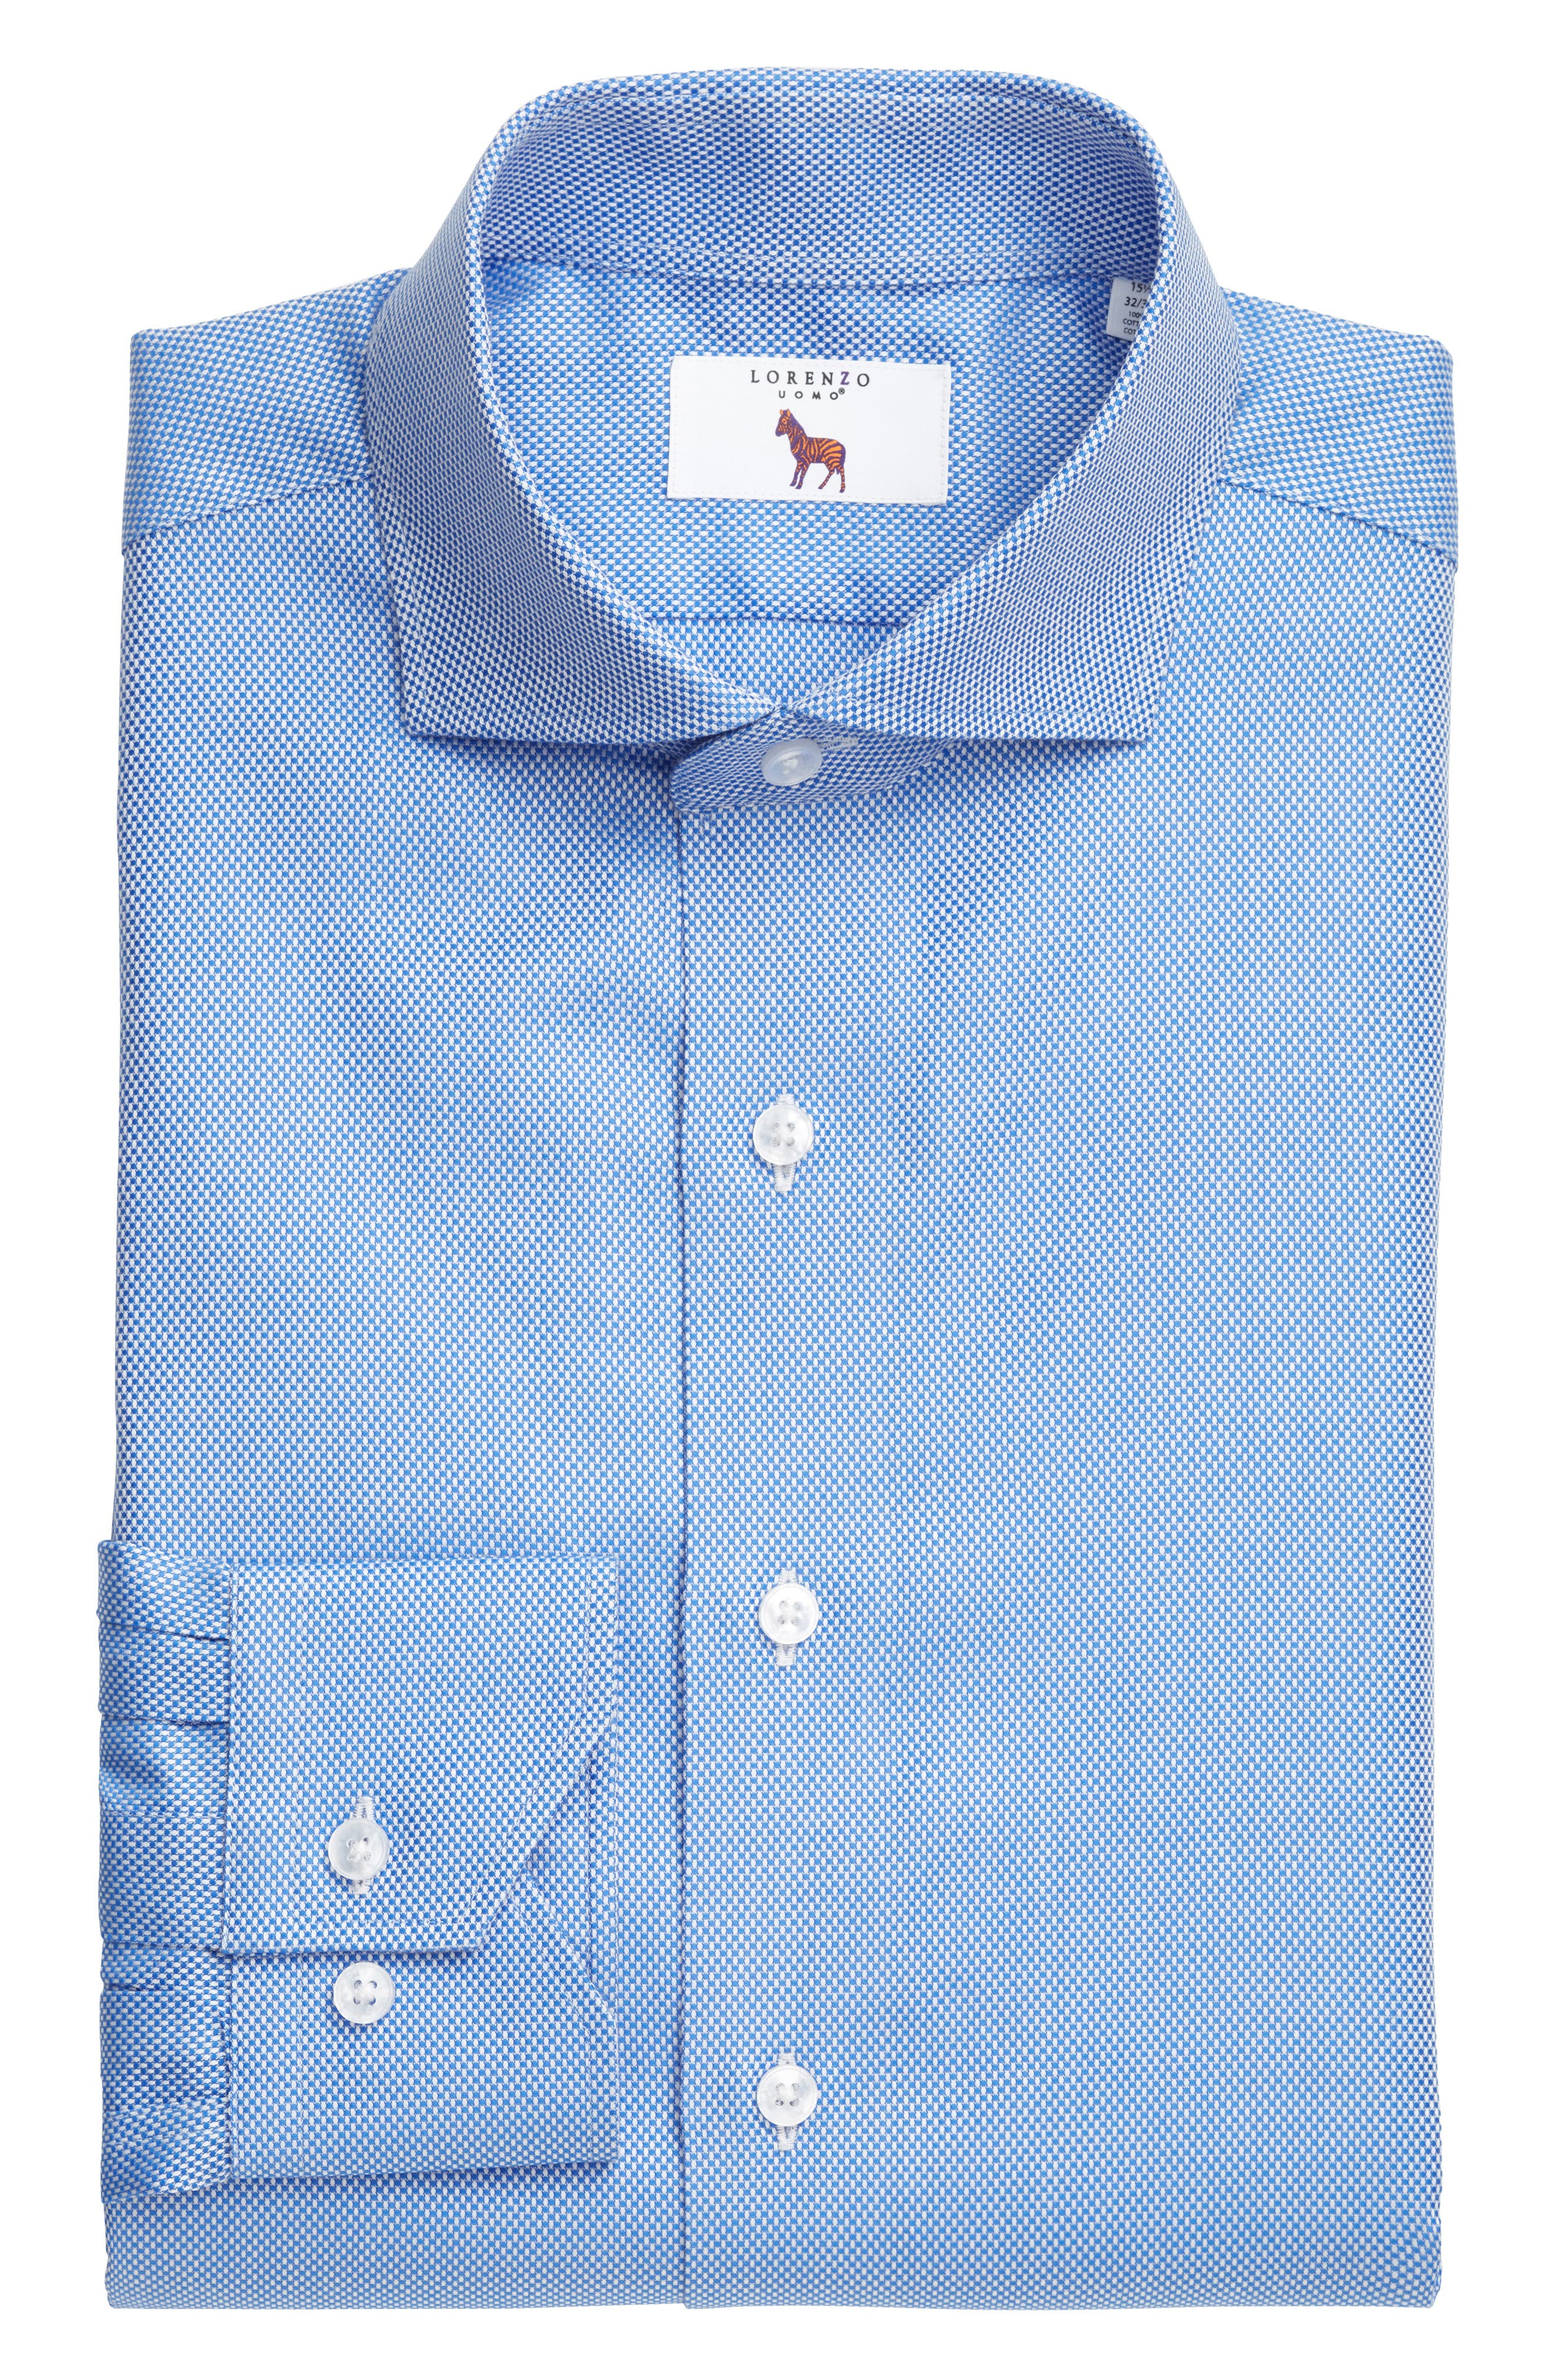 Lorenzo Uomo Trim Fit Texture Dress Shirt